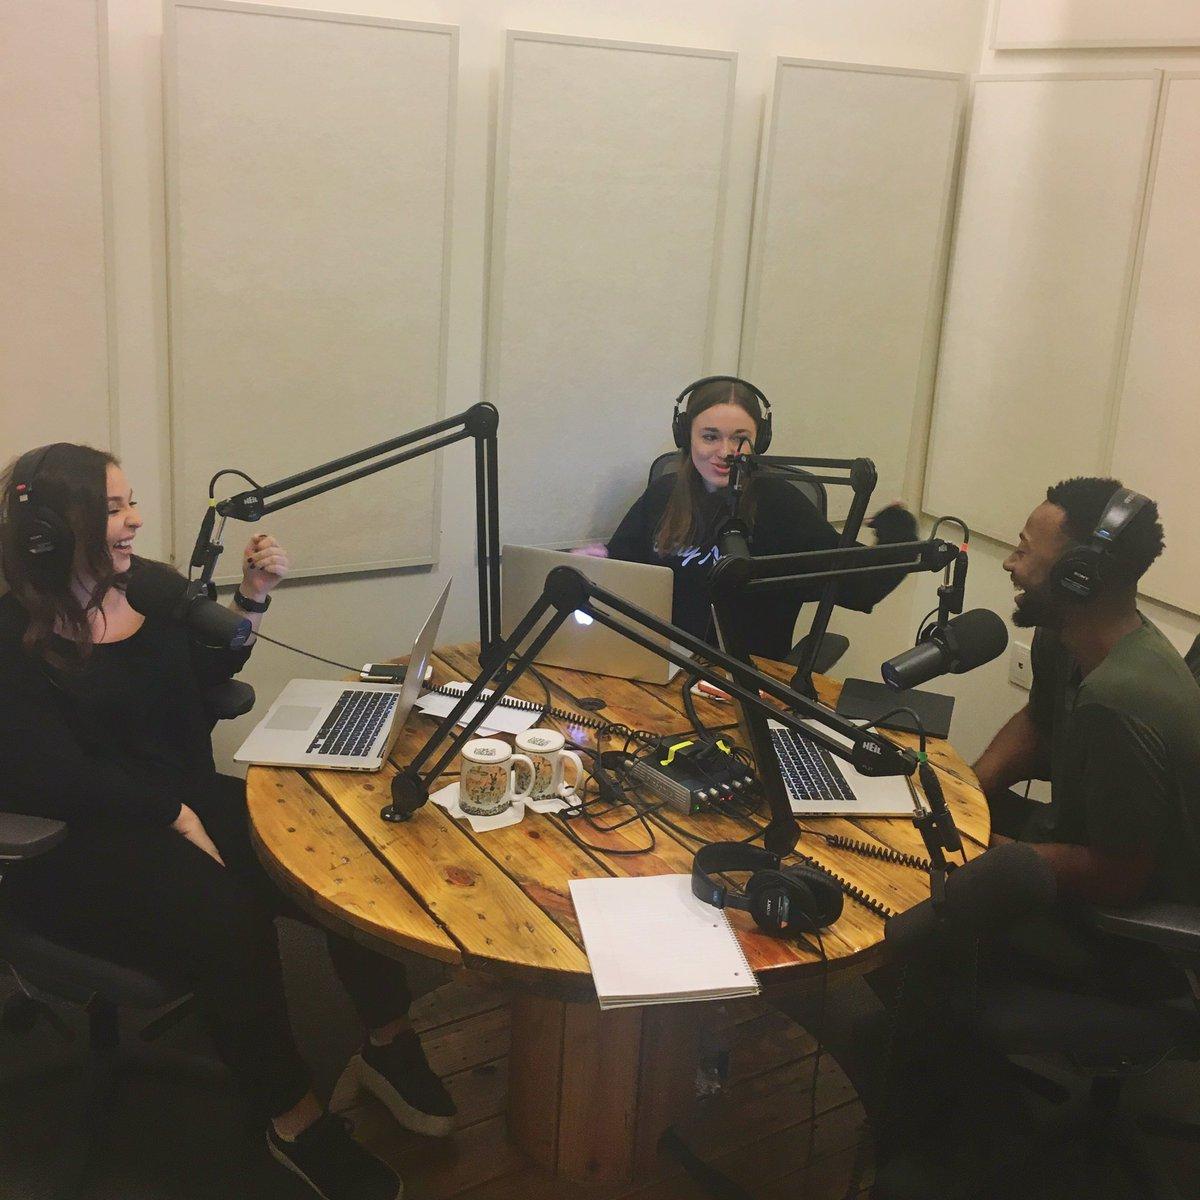 joined @Kaitiii & @mandaaabearr for the @MTVteenwolf podcast #TeamWolf today